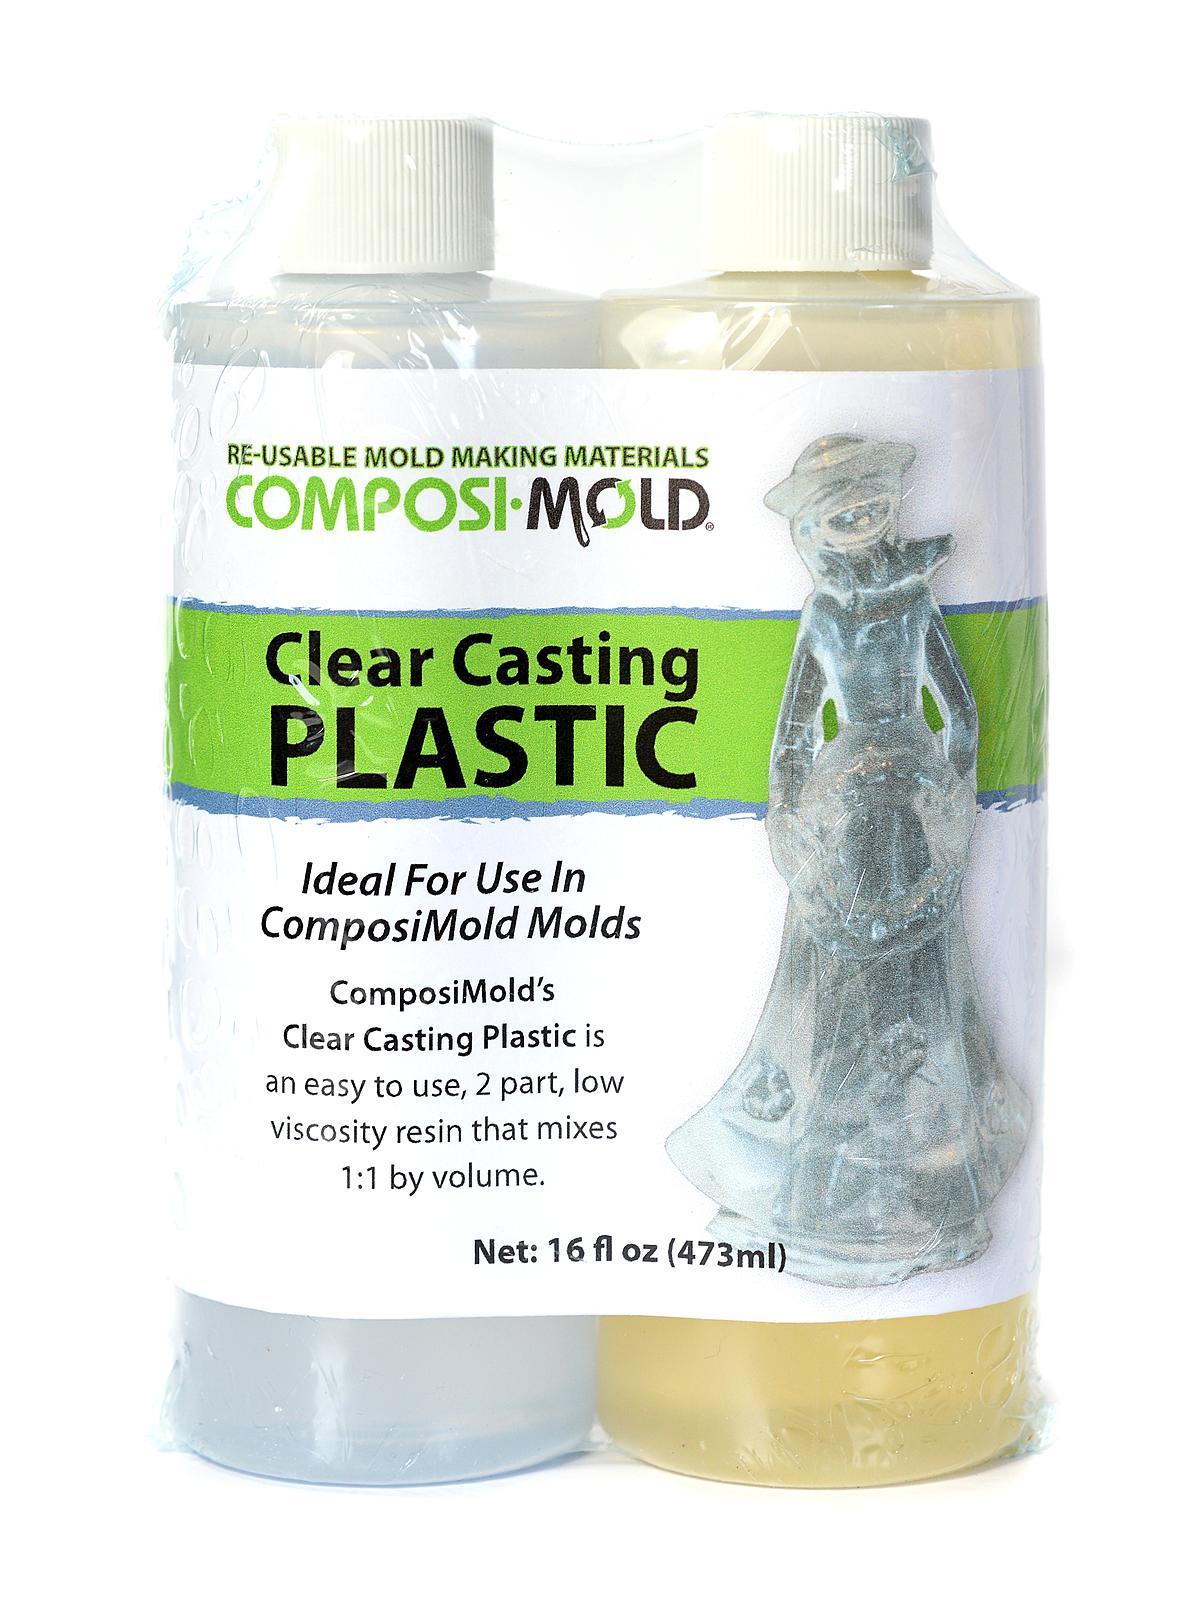 Composimold Clear Casting Plastic Misterart Com